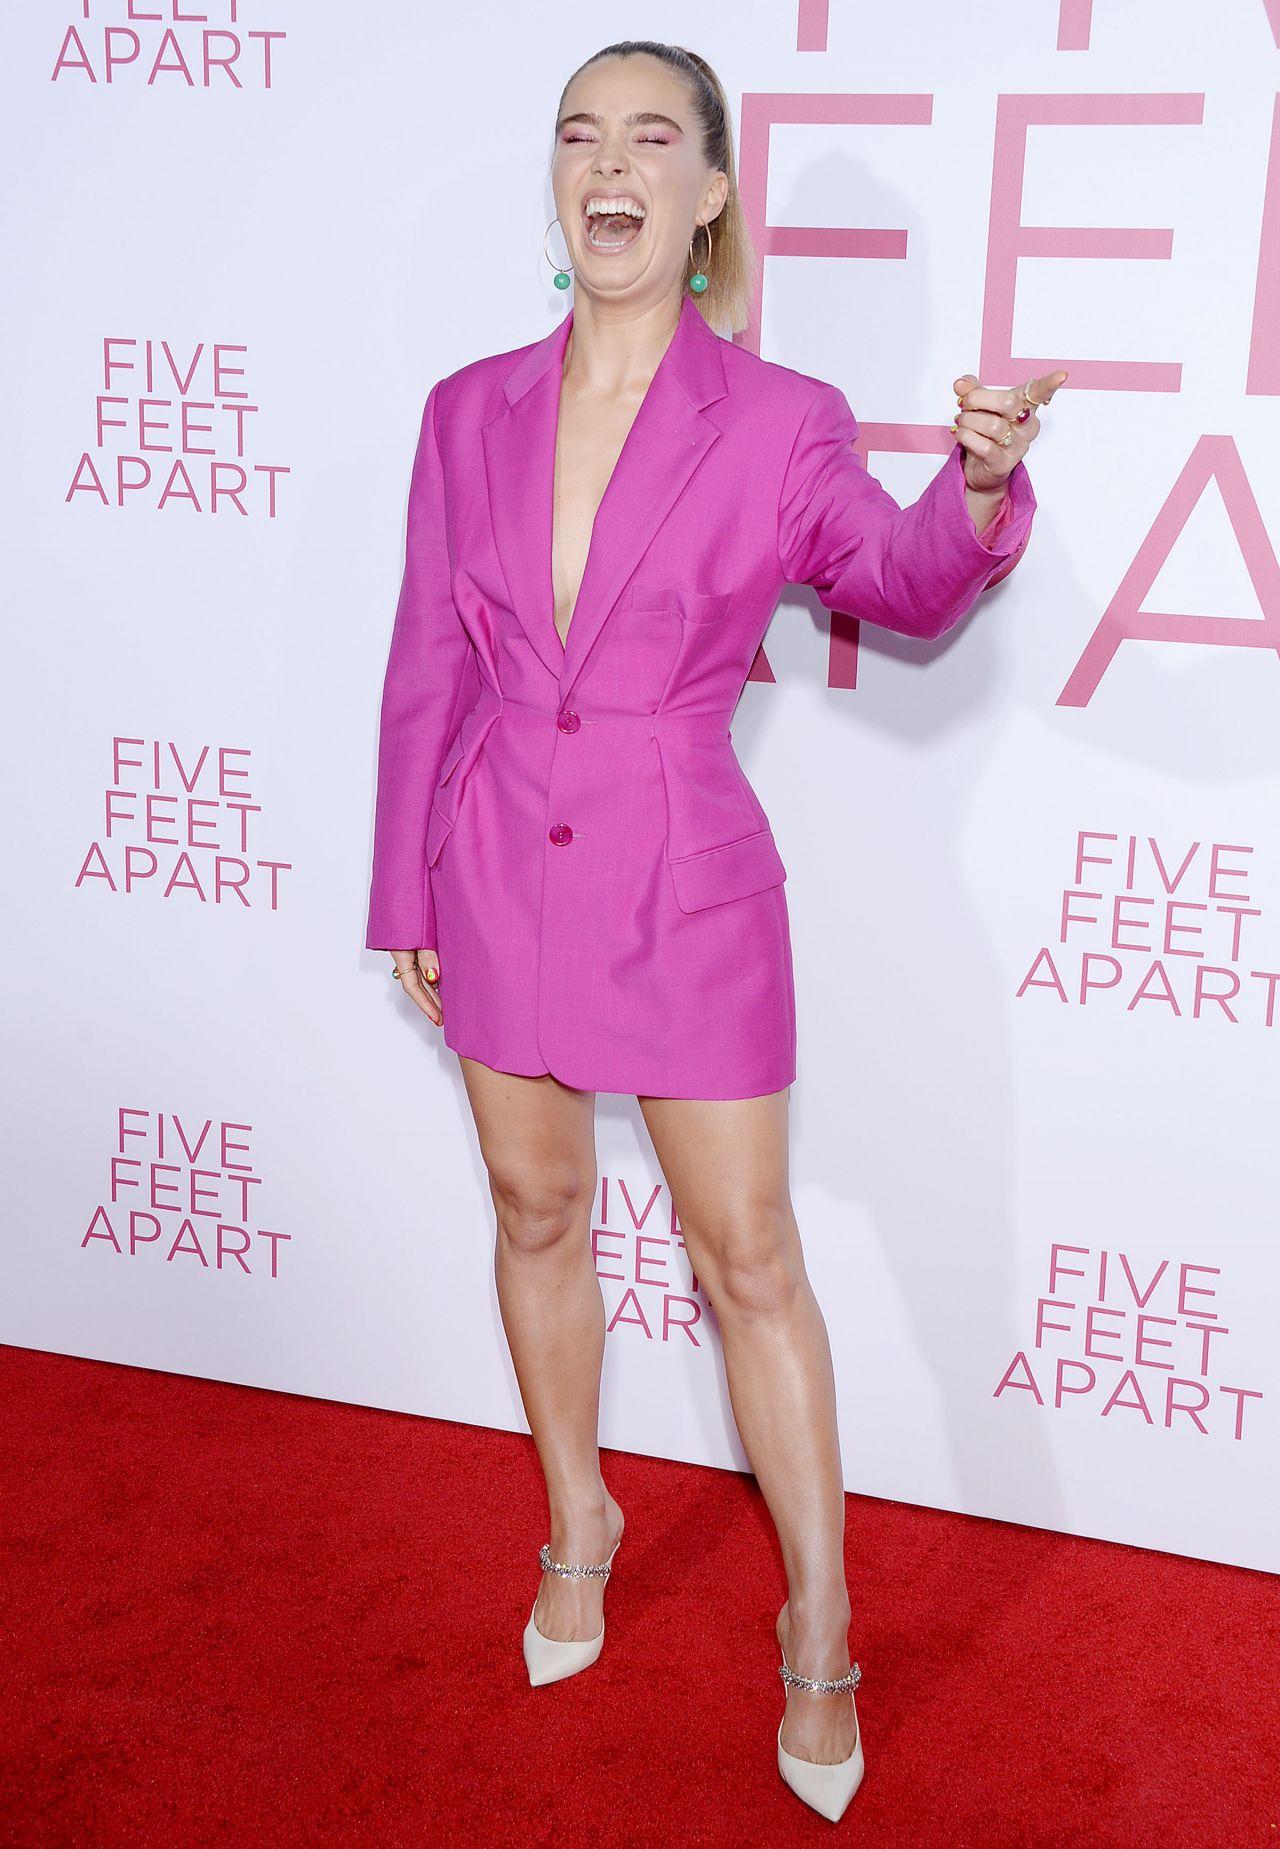 Haley Lu Richardson Five Feet Apart Premiere In LA